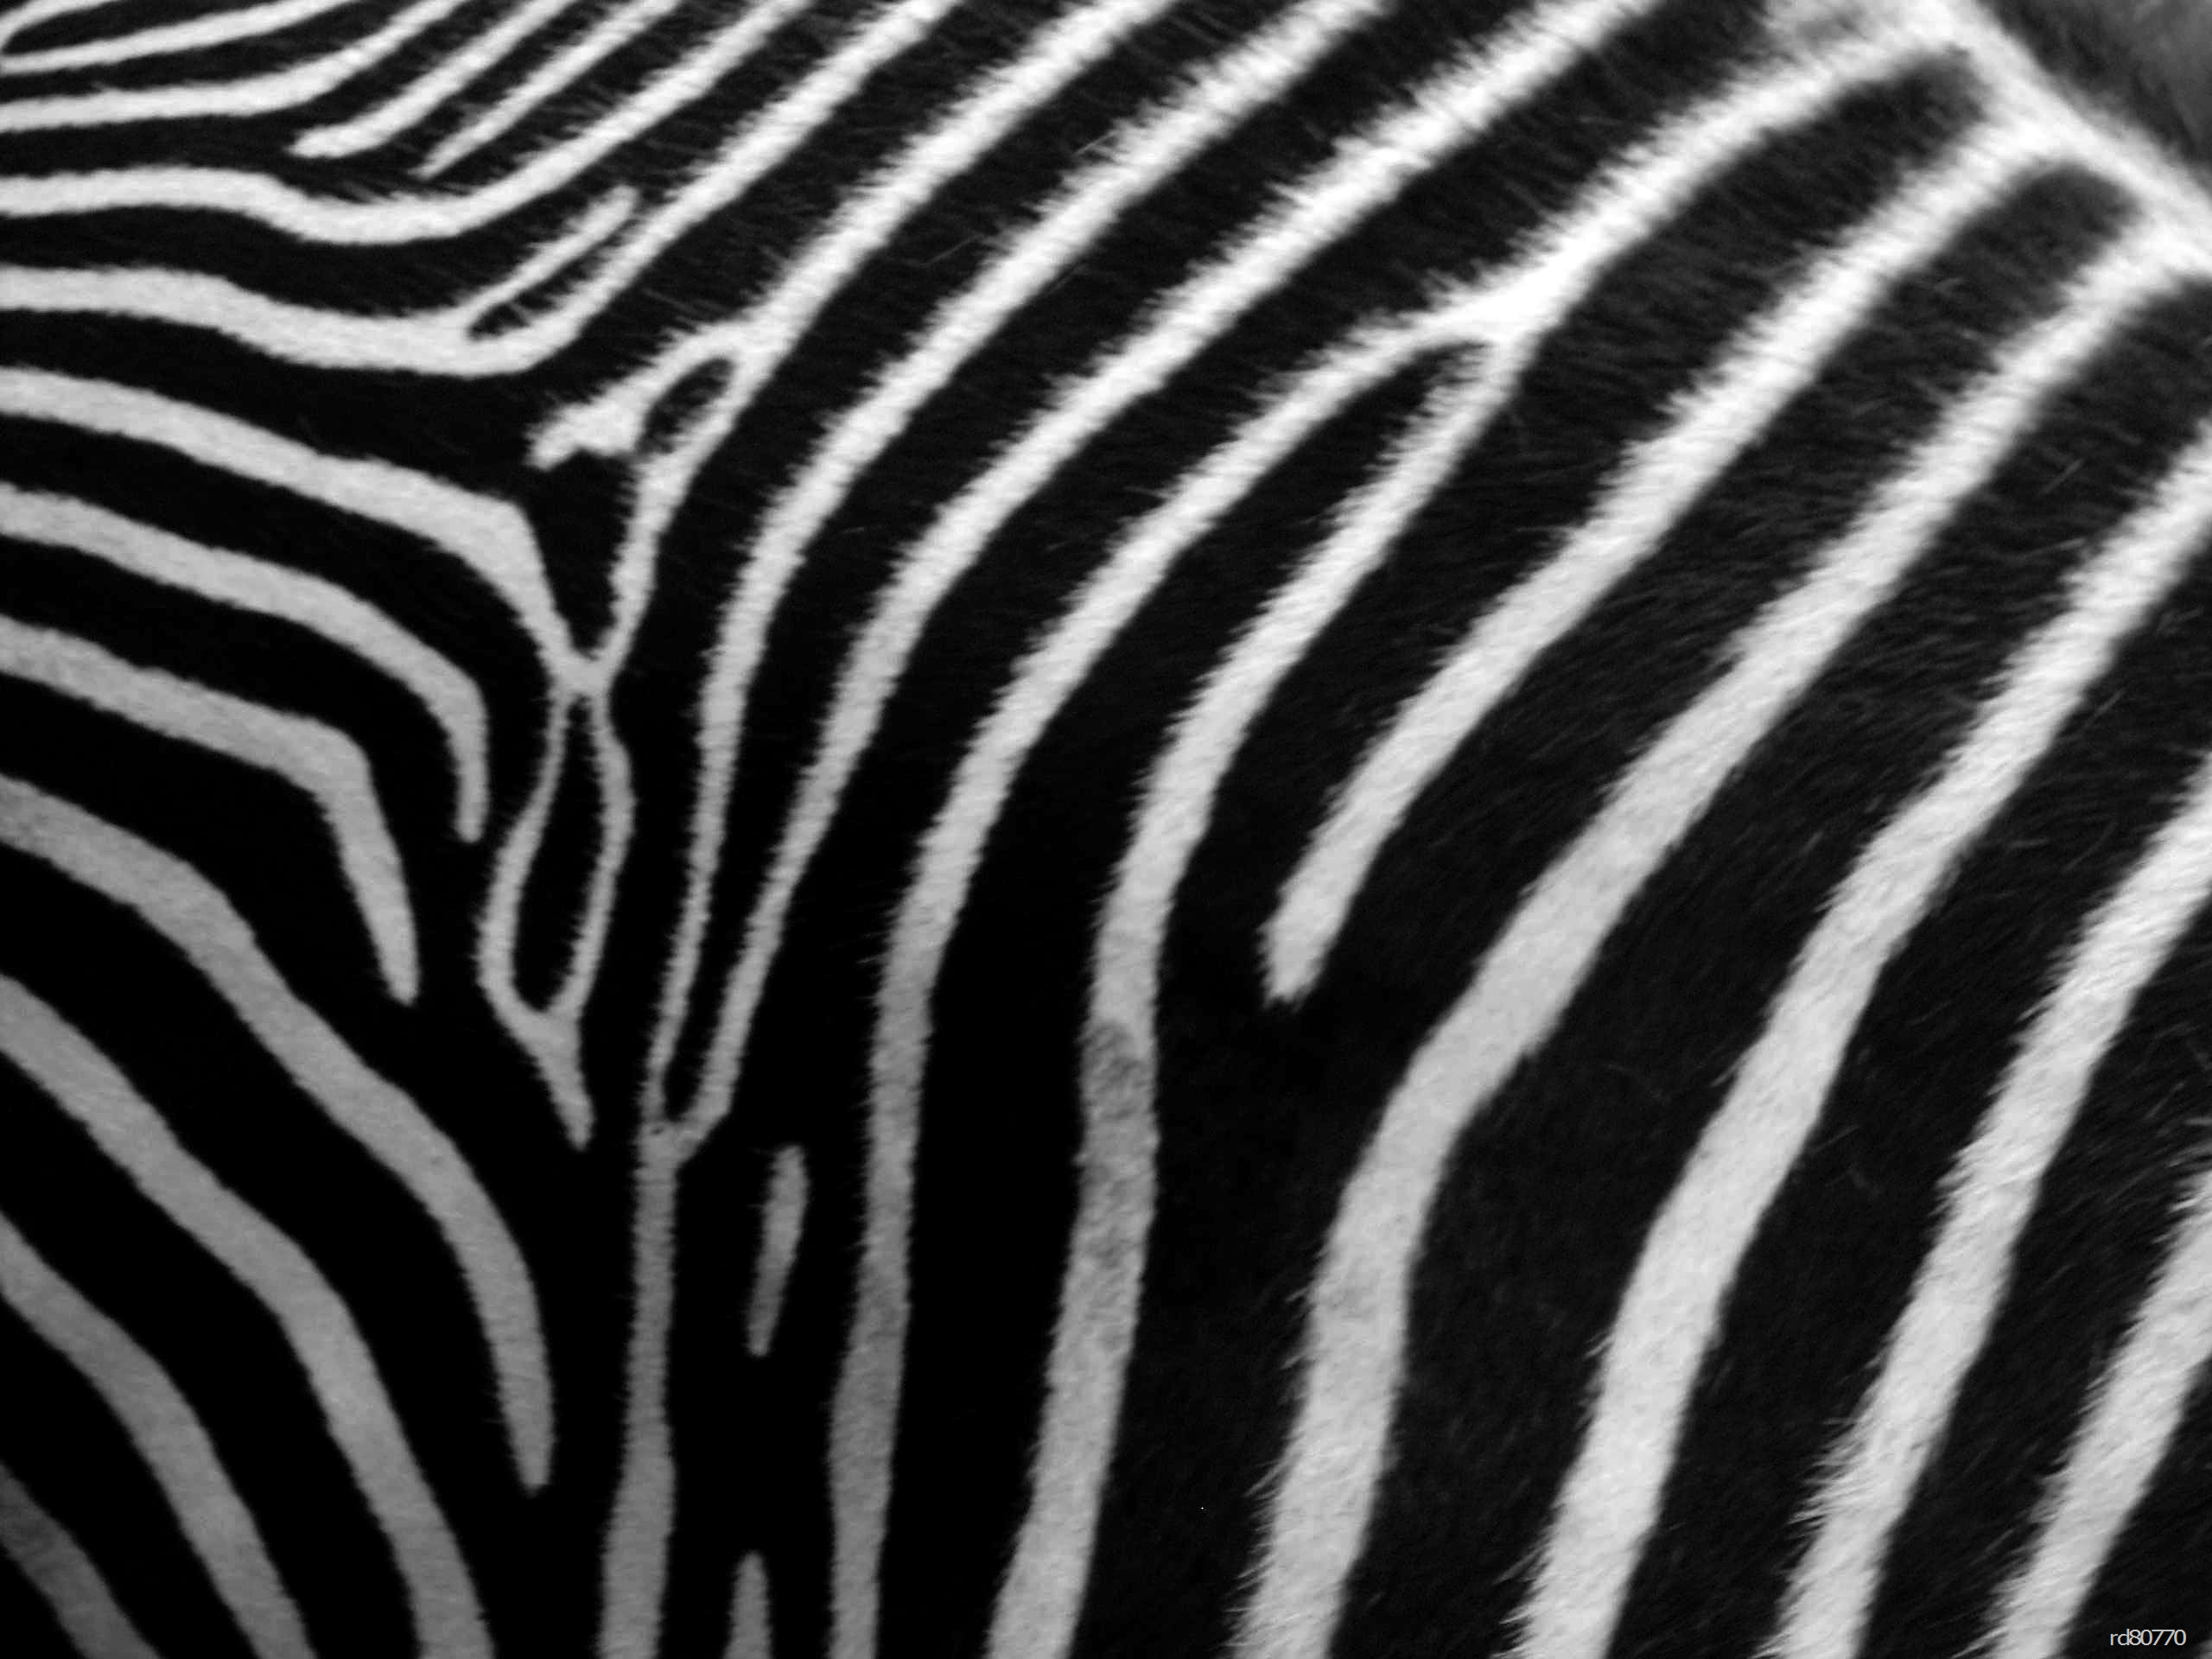 Animal Print Zebra Skin Phone 1191141 Wallpaper wallpaper